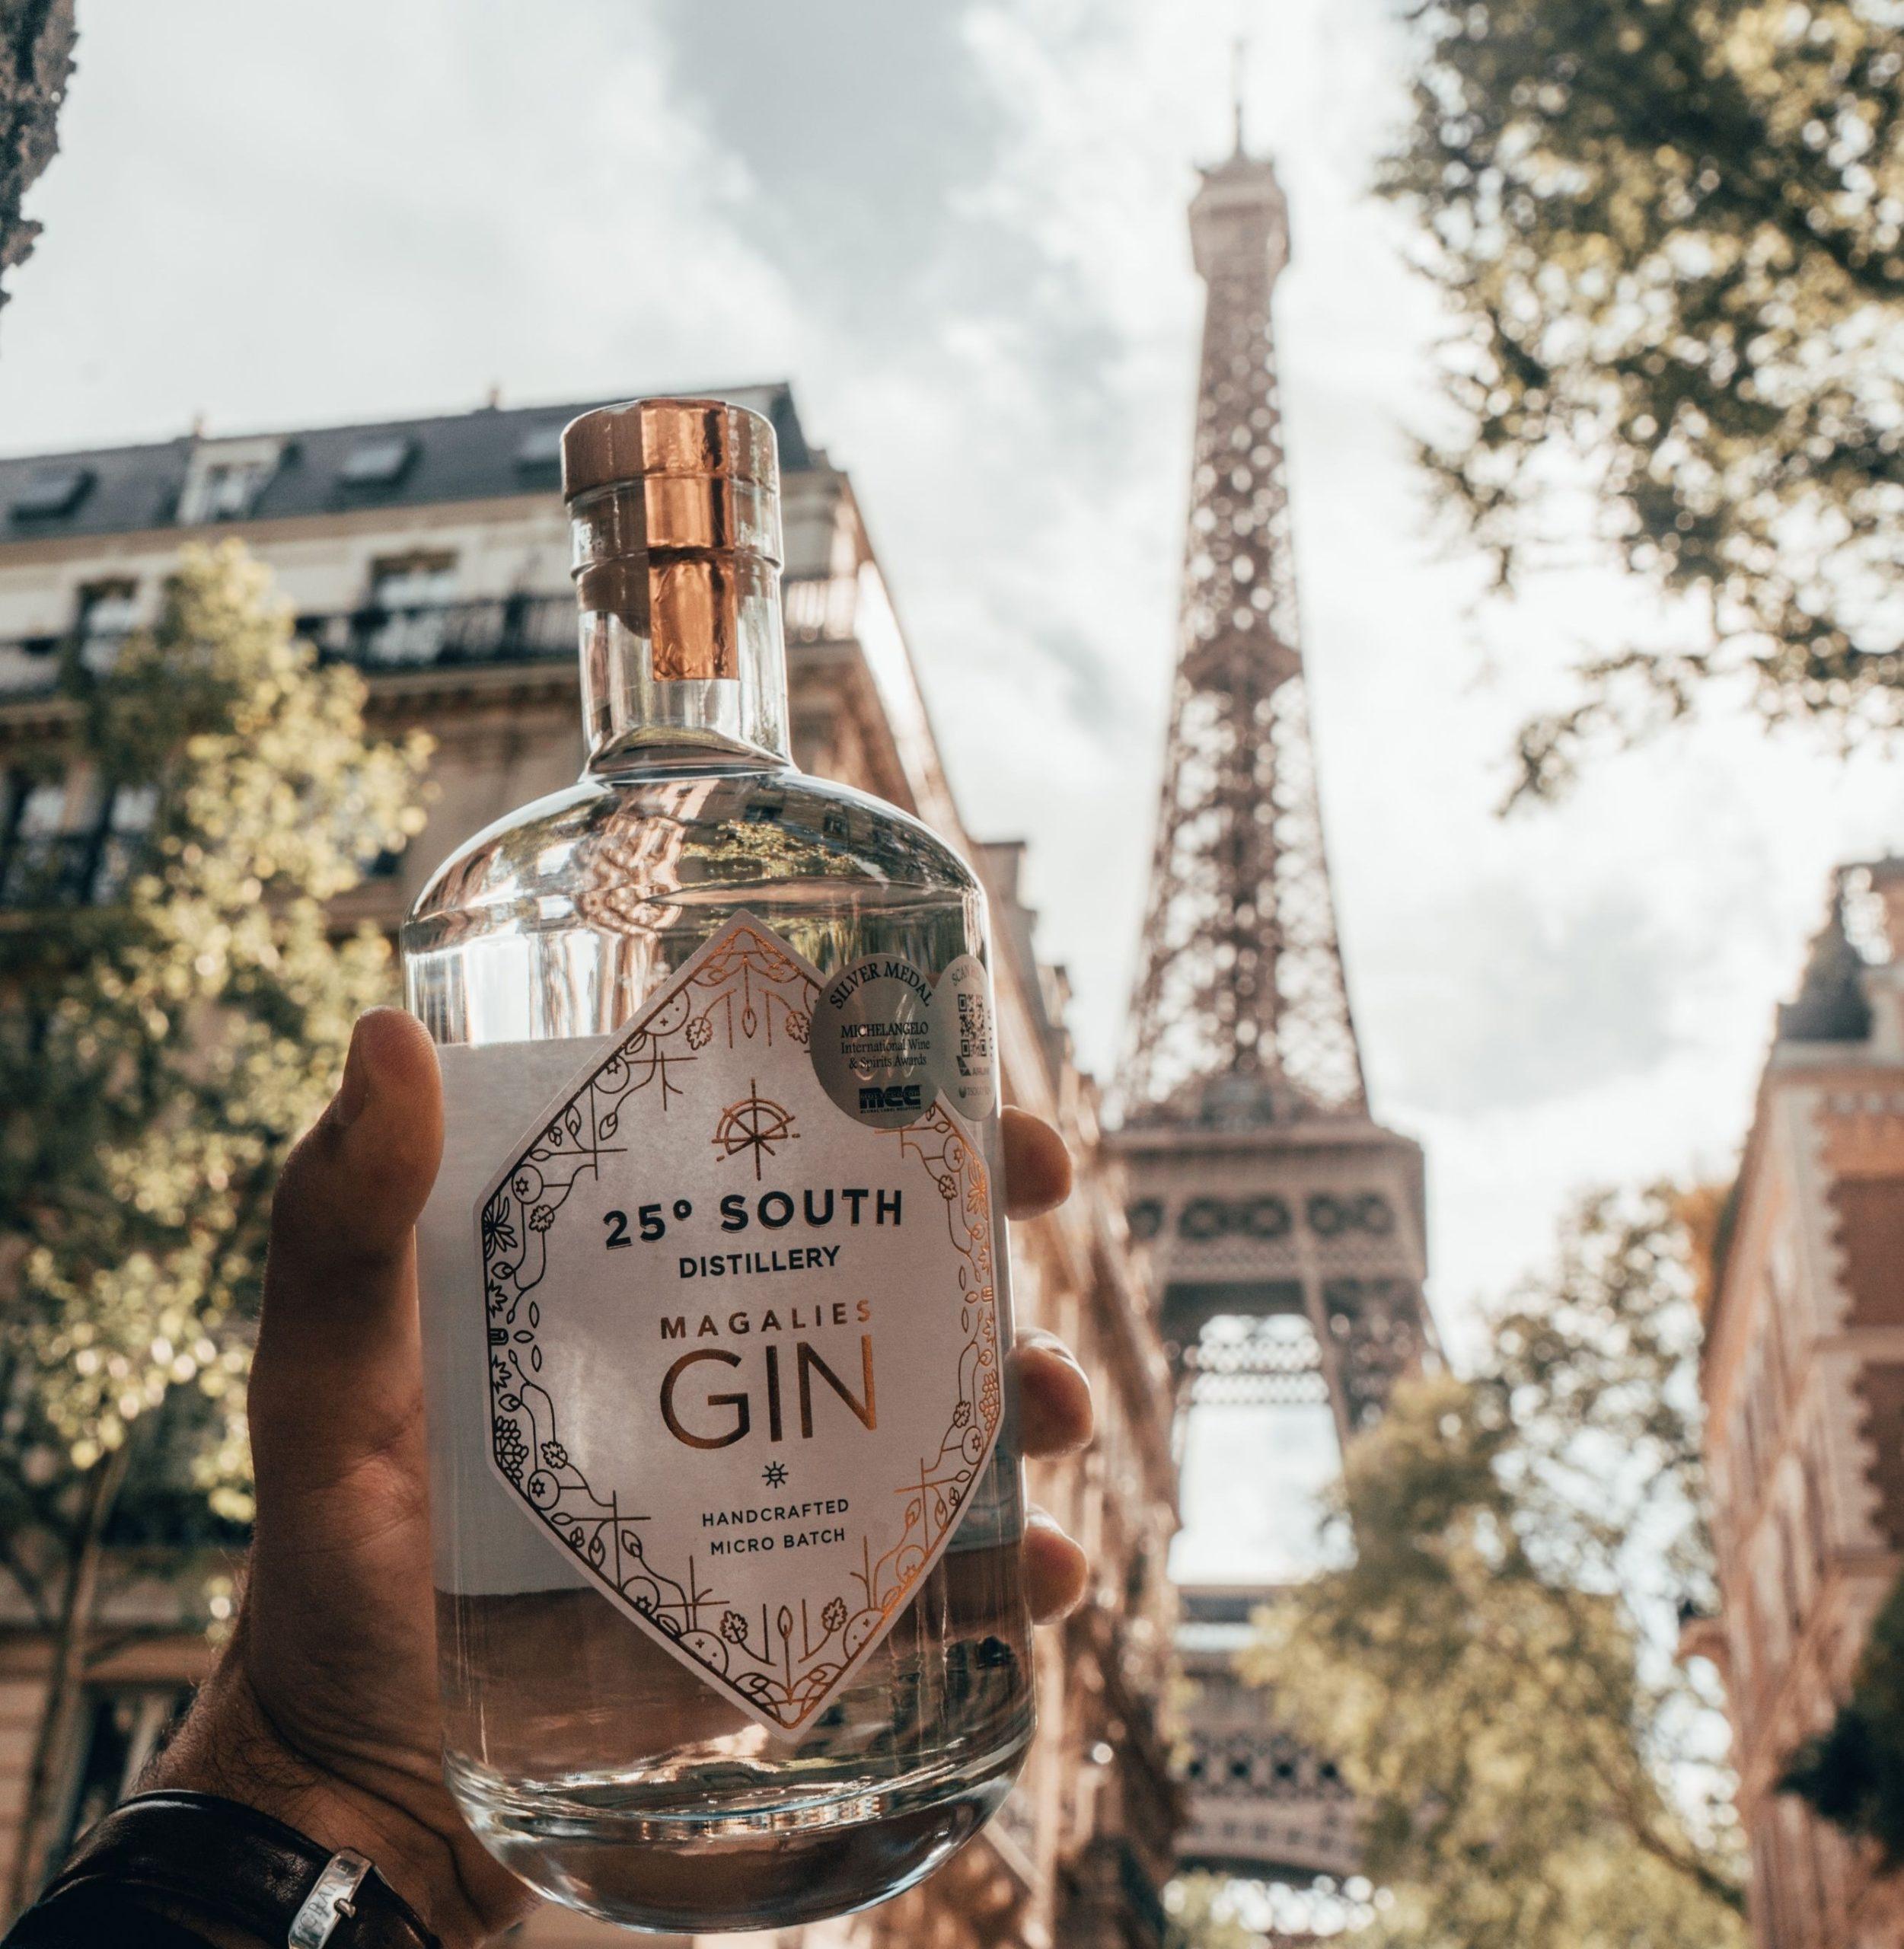 Magalies Craft Gin in France made in Pretoria